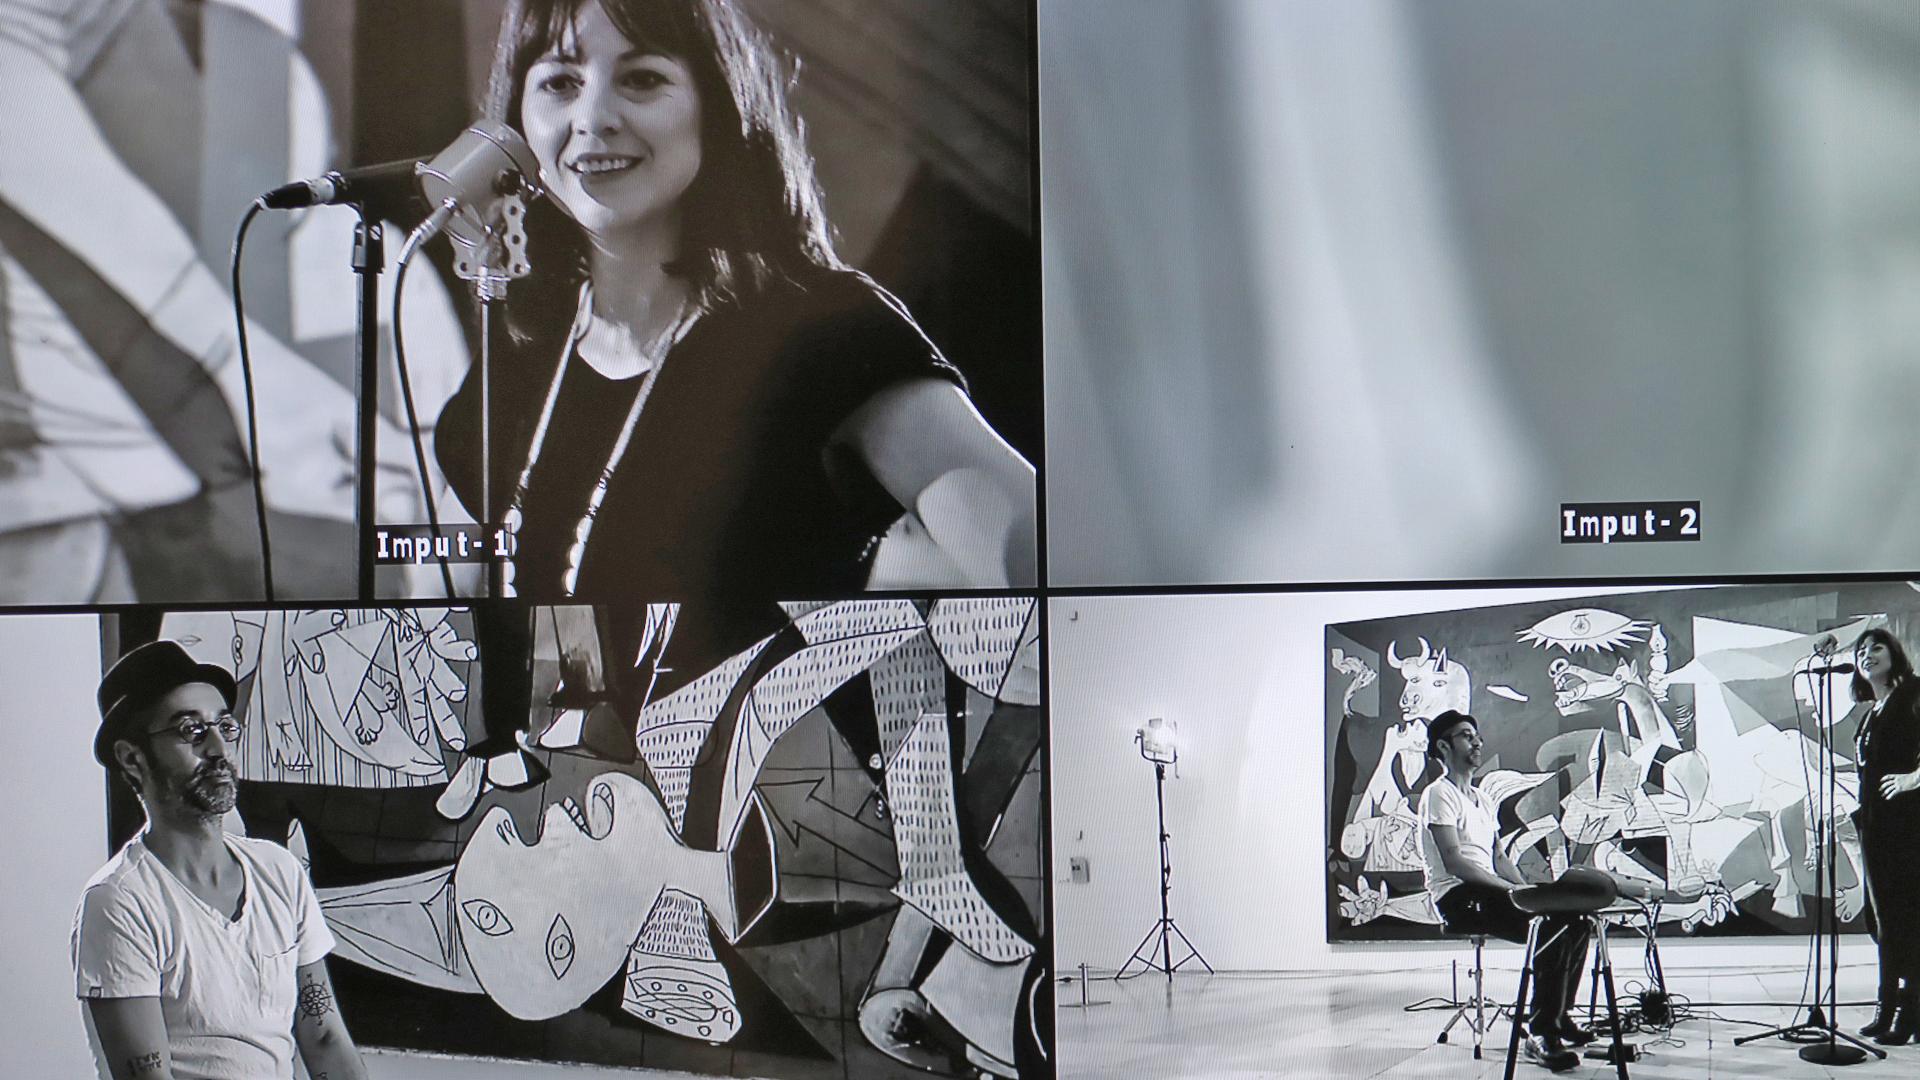 Suena Guernica - Marlango, 'Not without you'